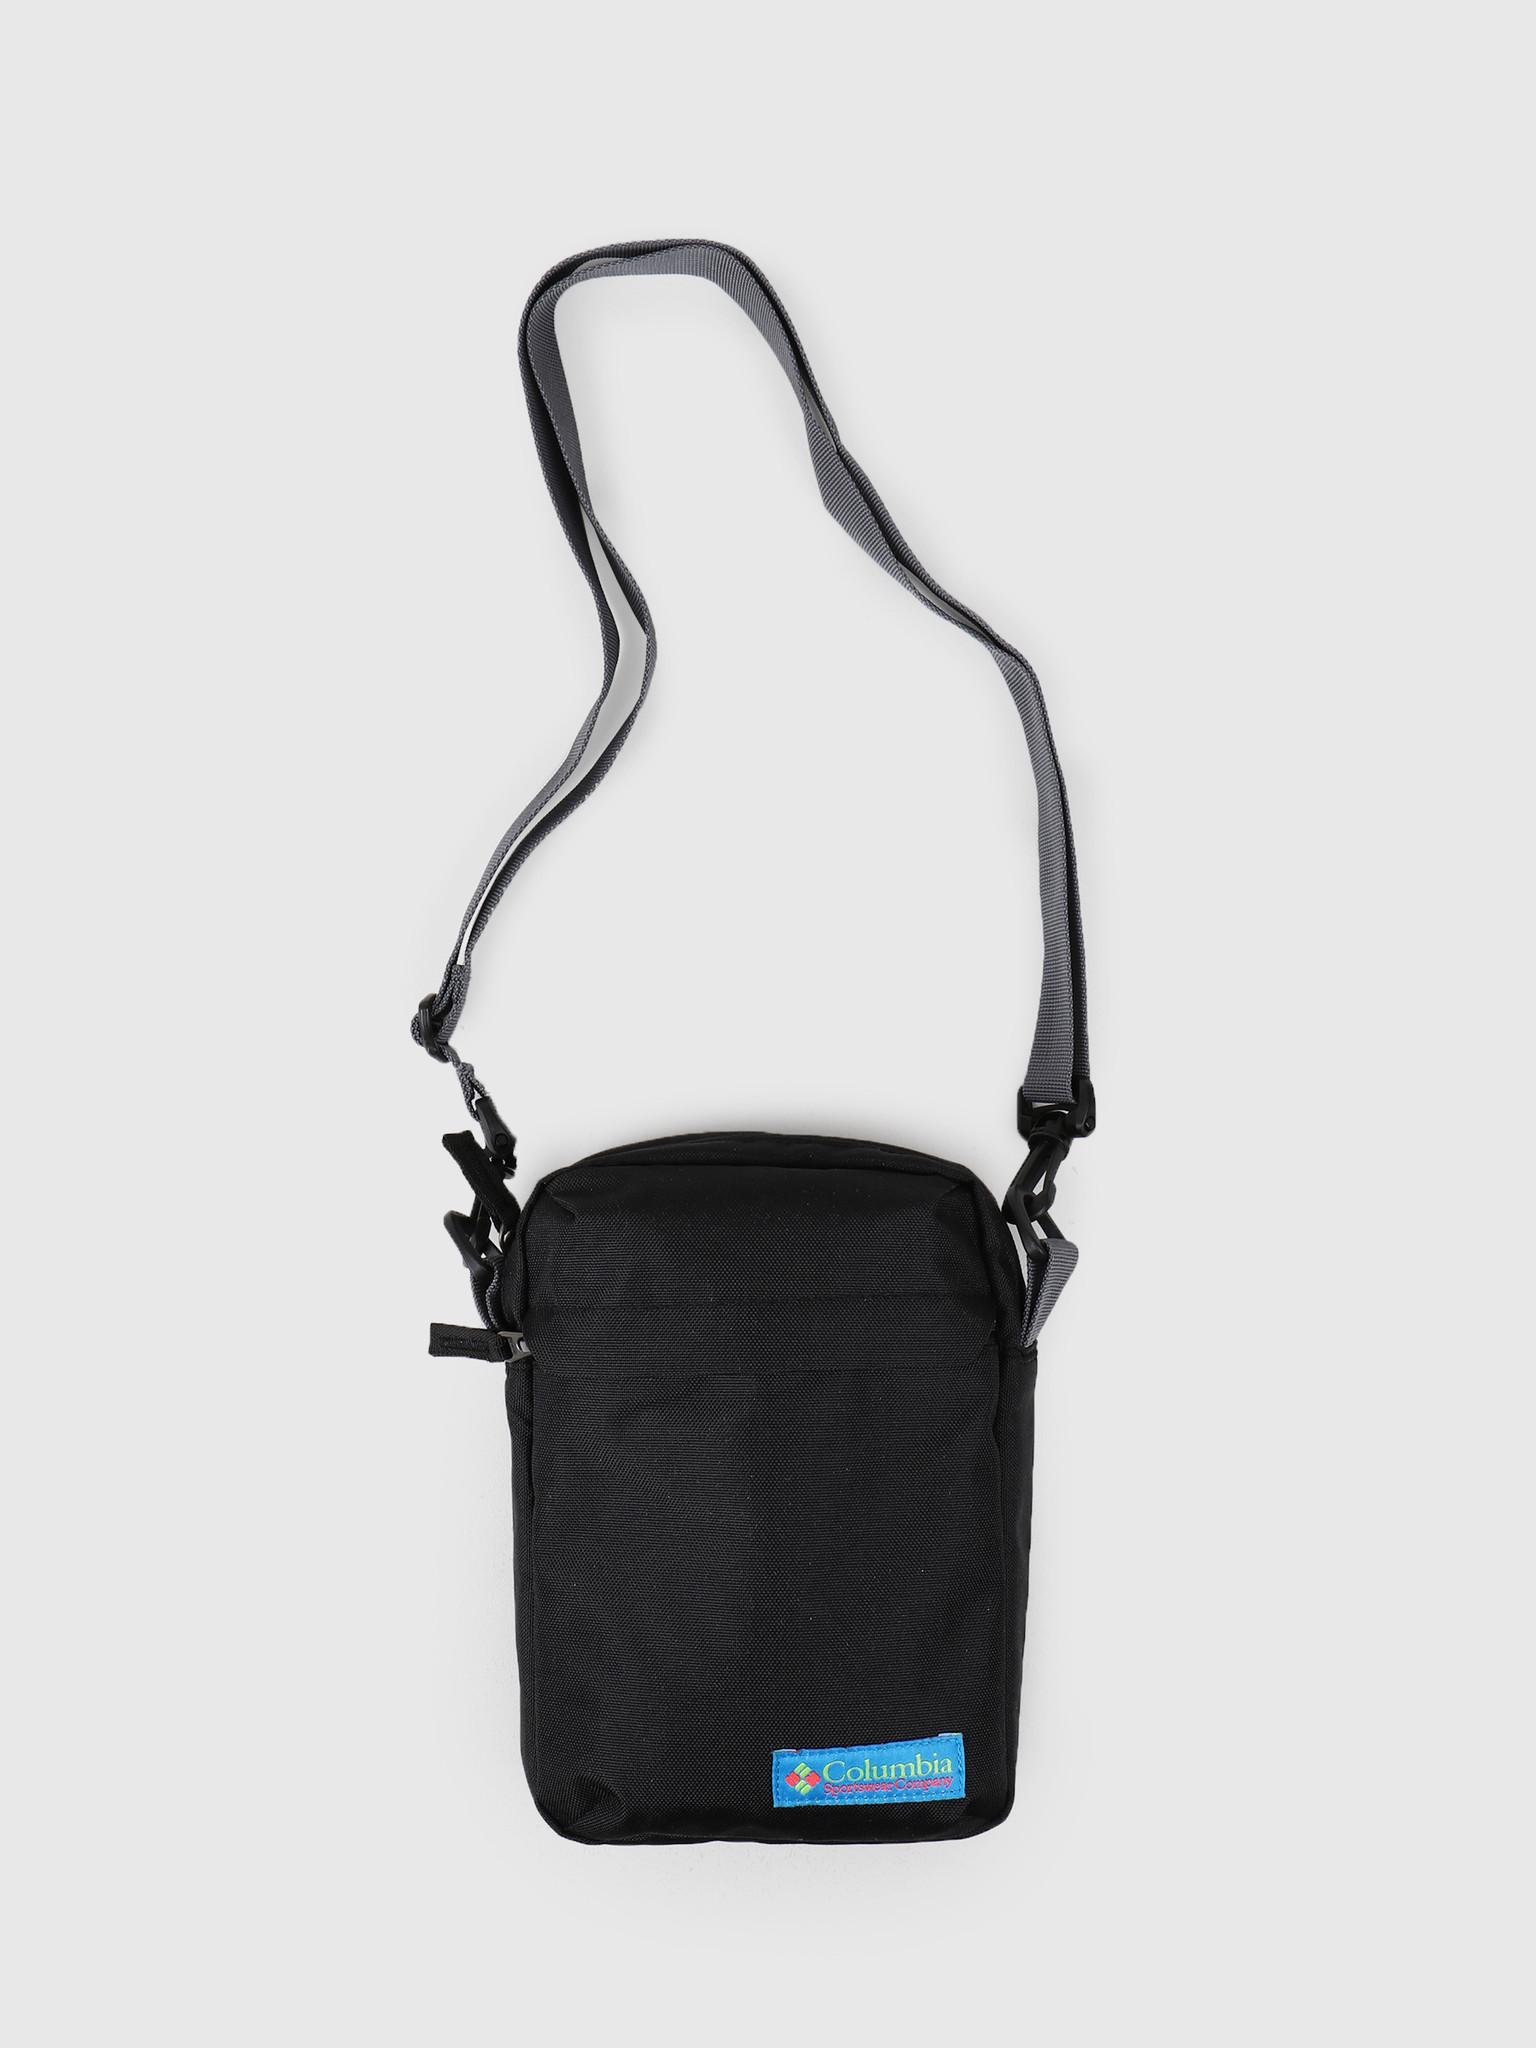 Columbia Columbia Urban Uplift Side Bag Black 1724821011